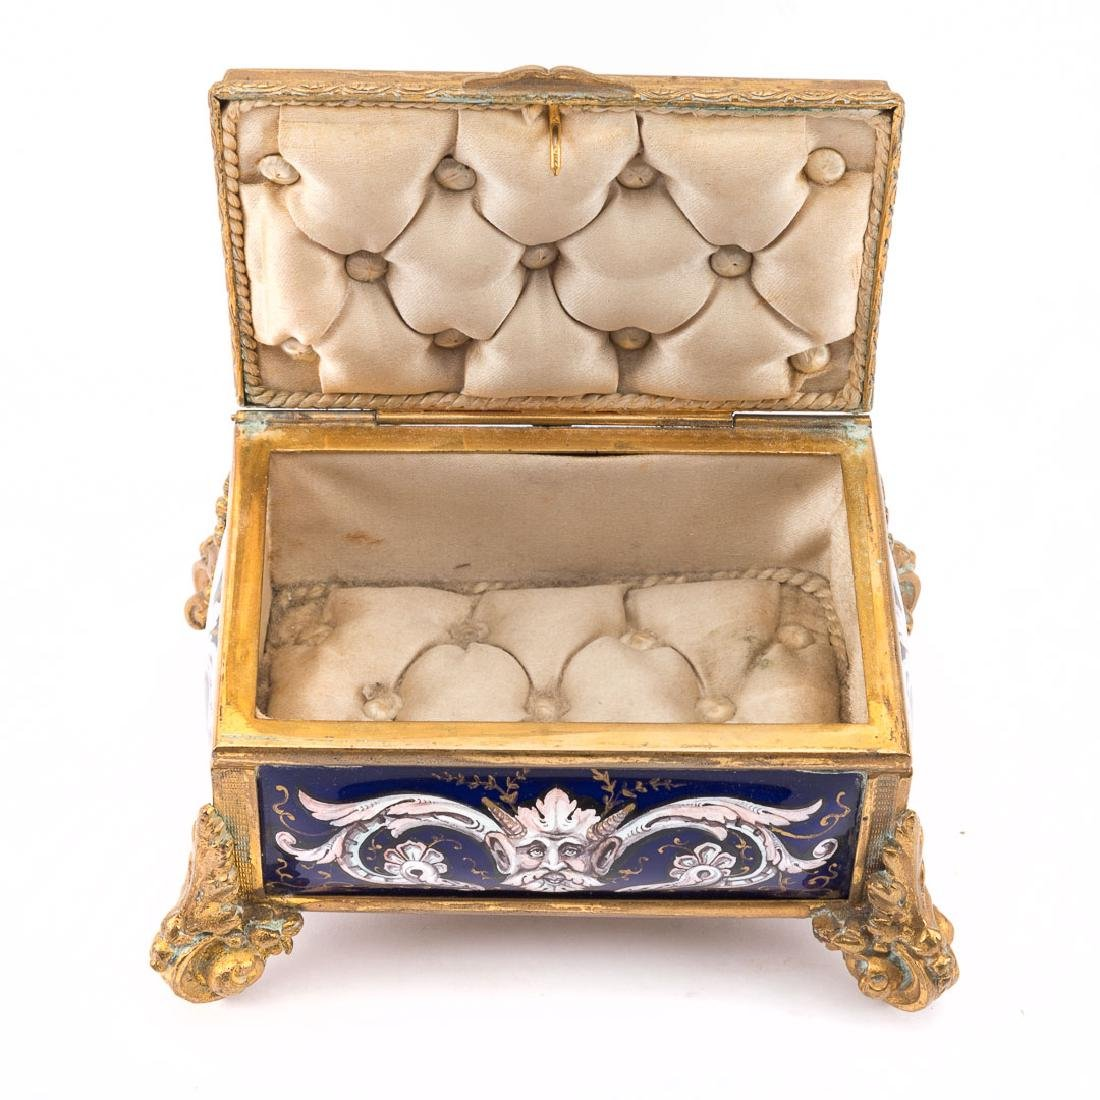 Limoges enamel box - 4